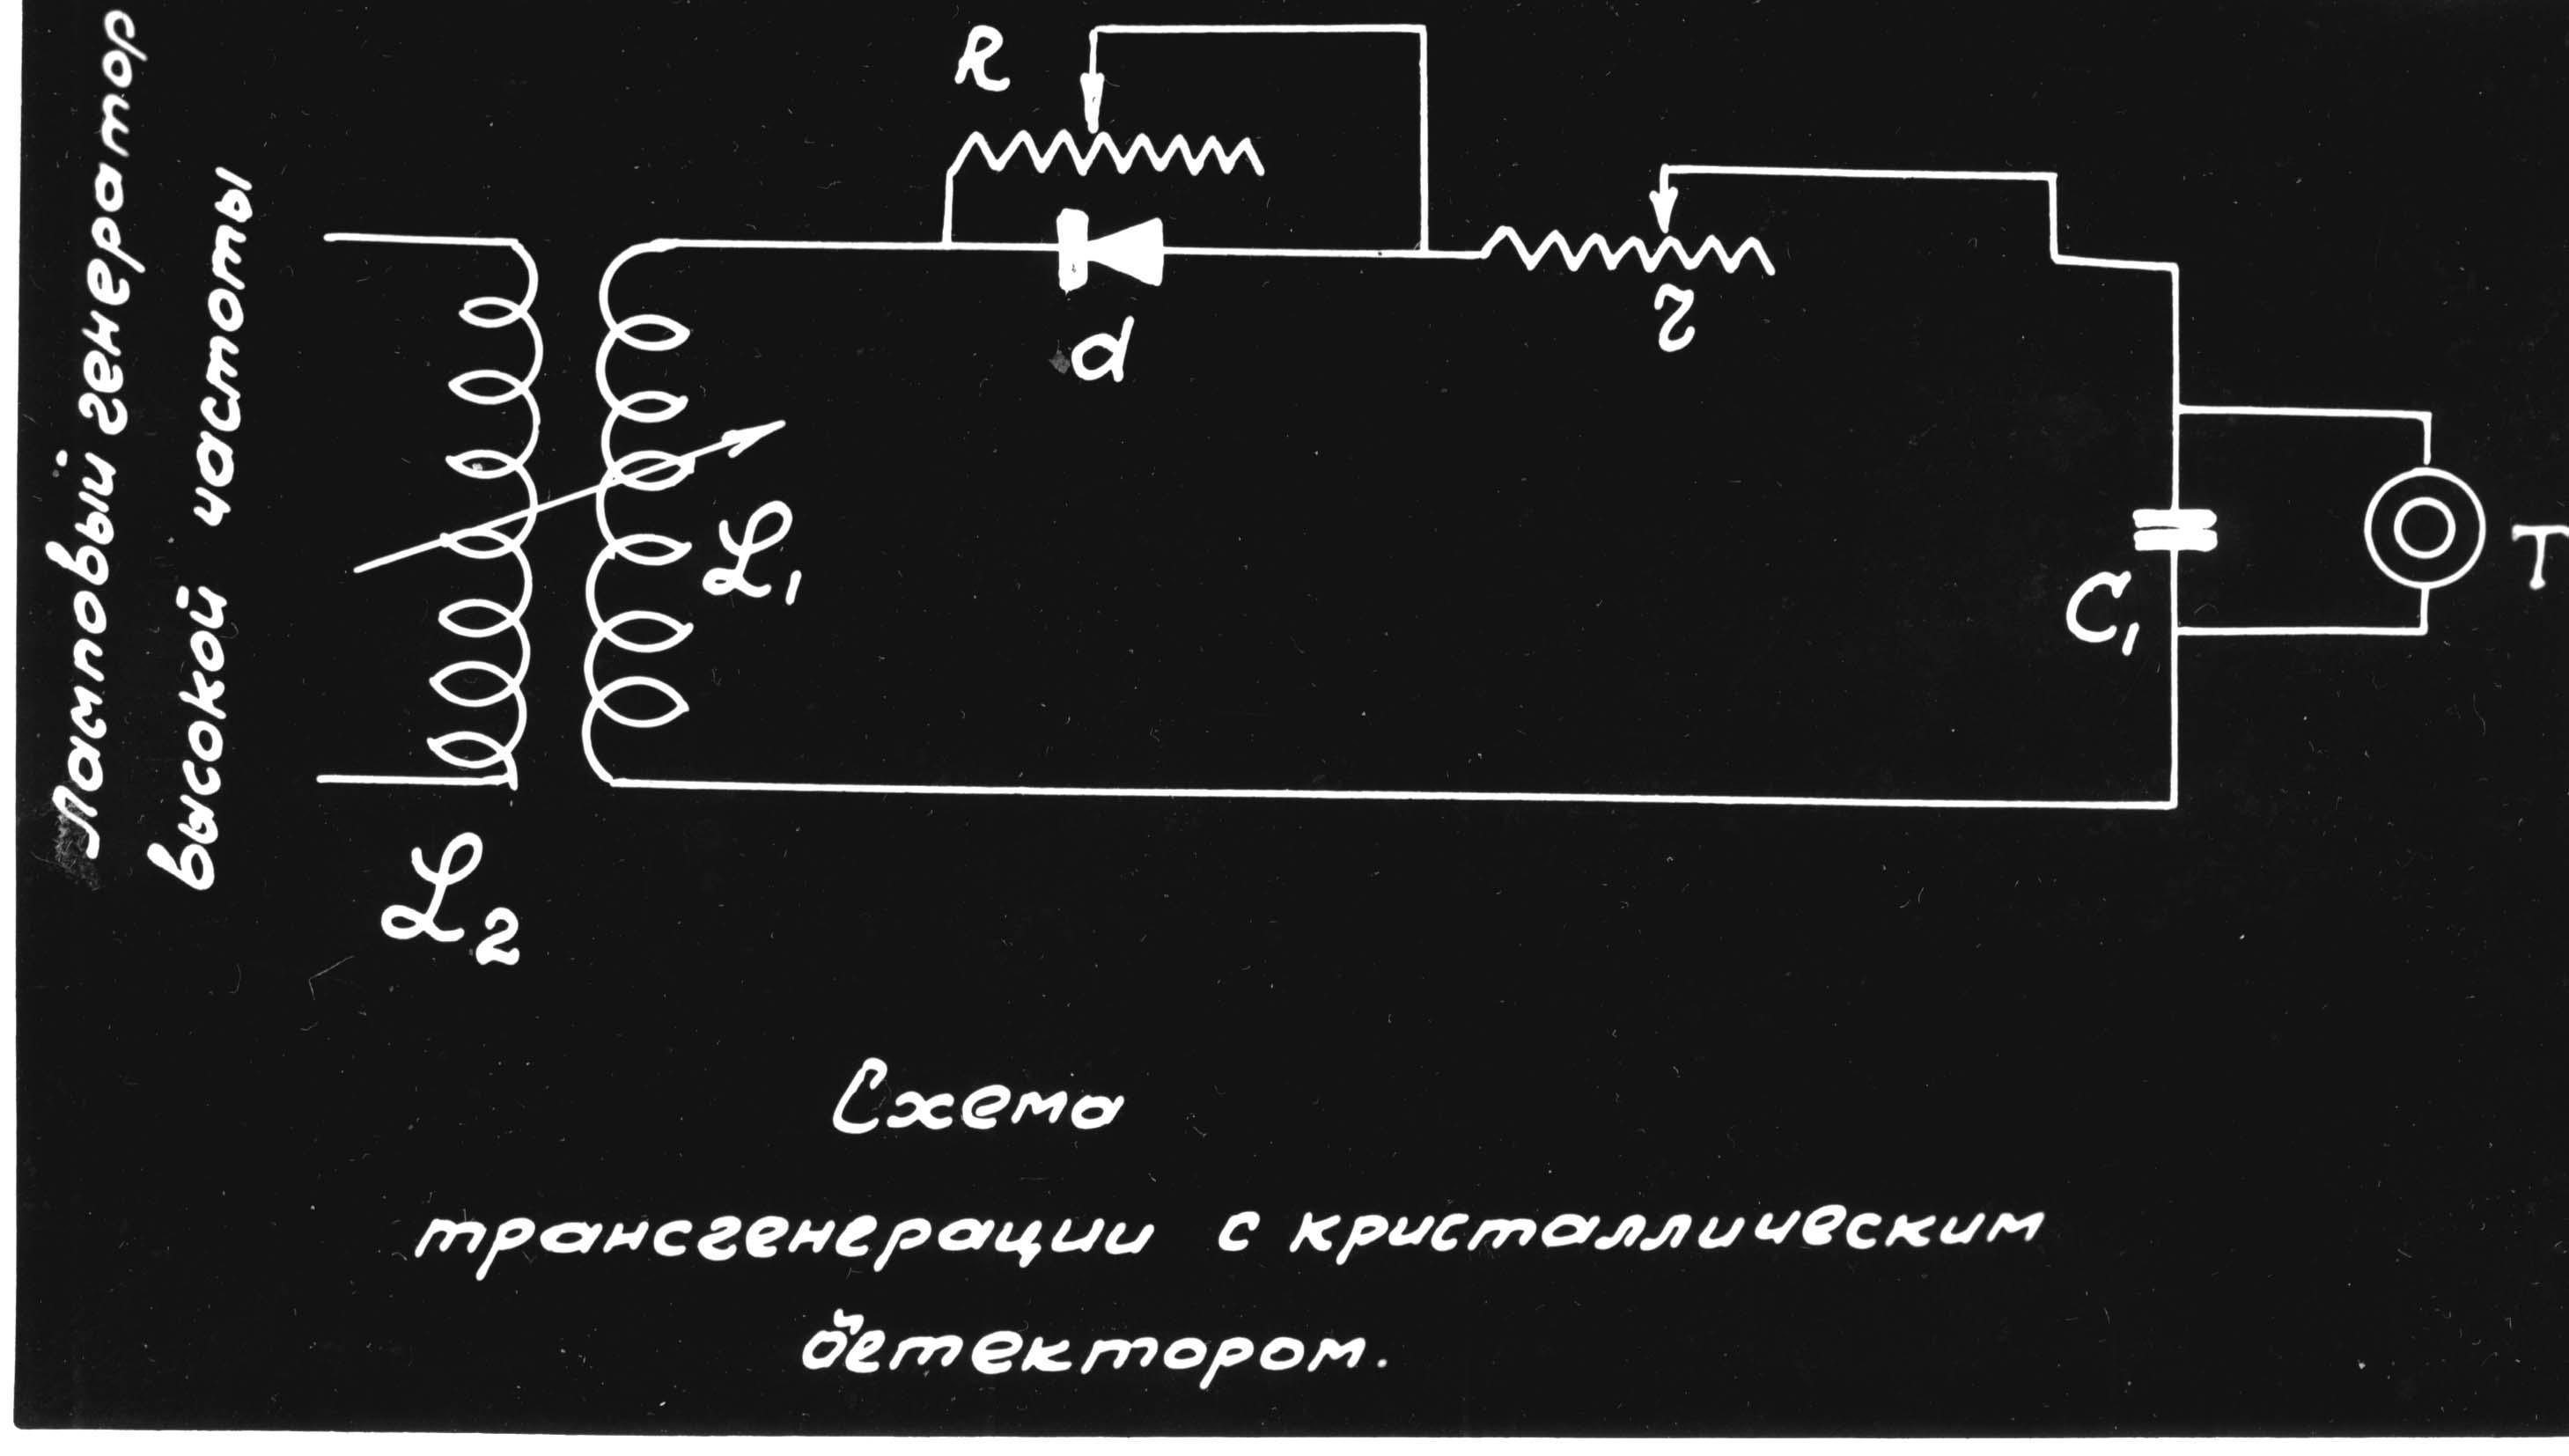 схема конденсатора его схема и работа